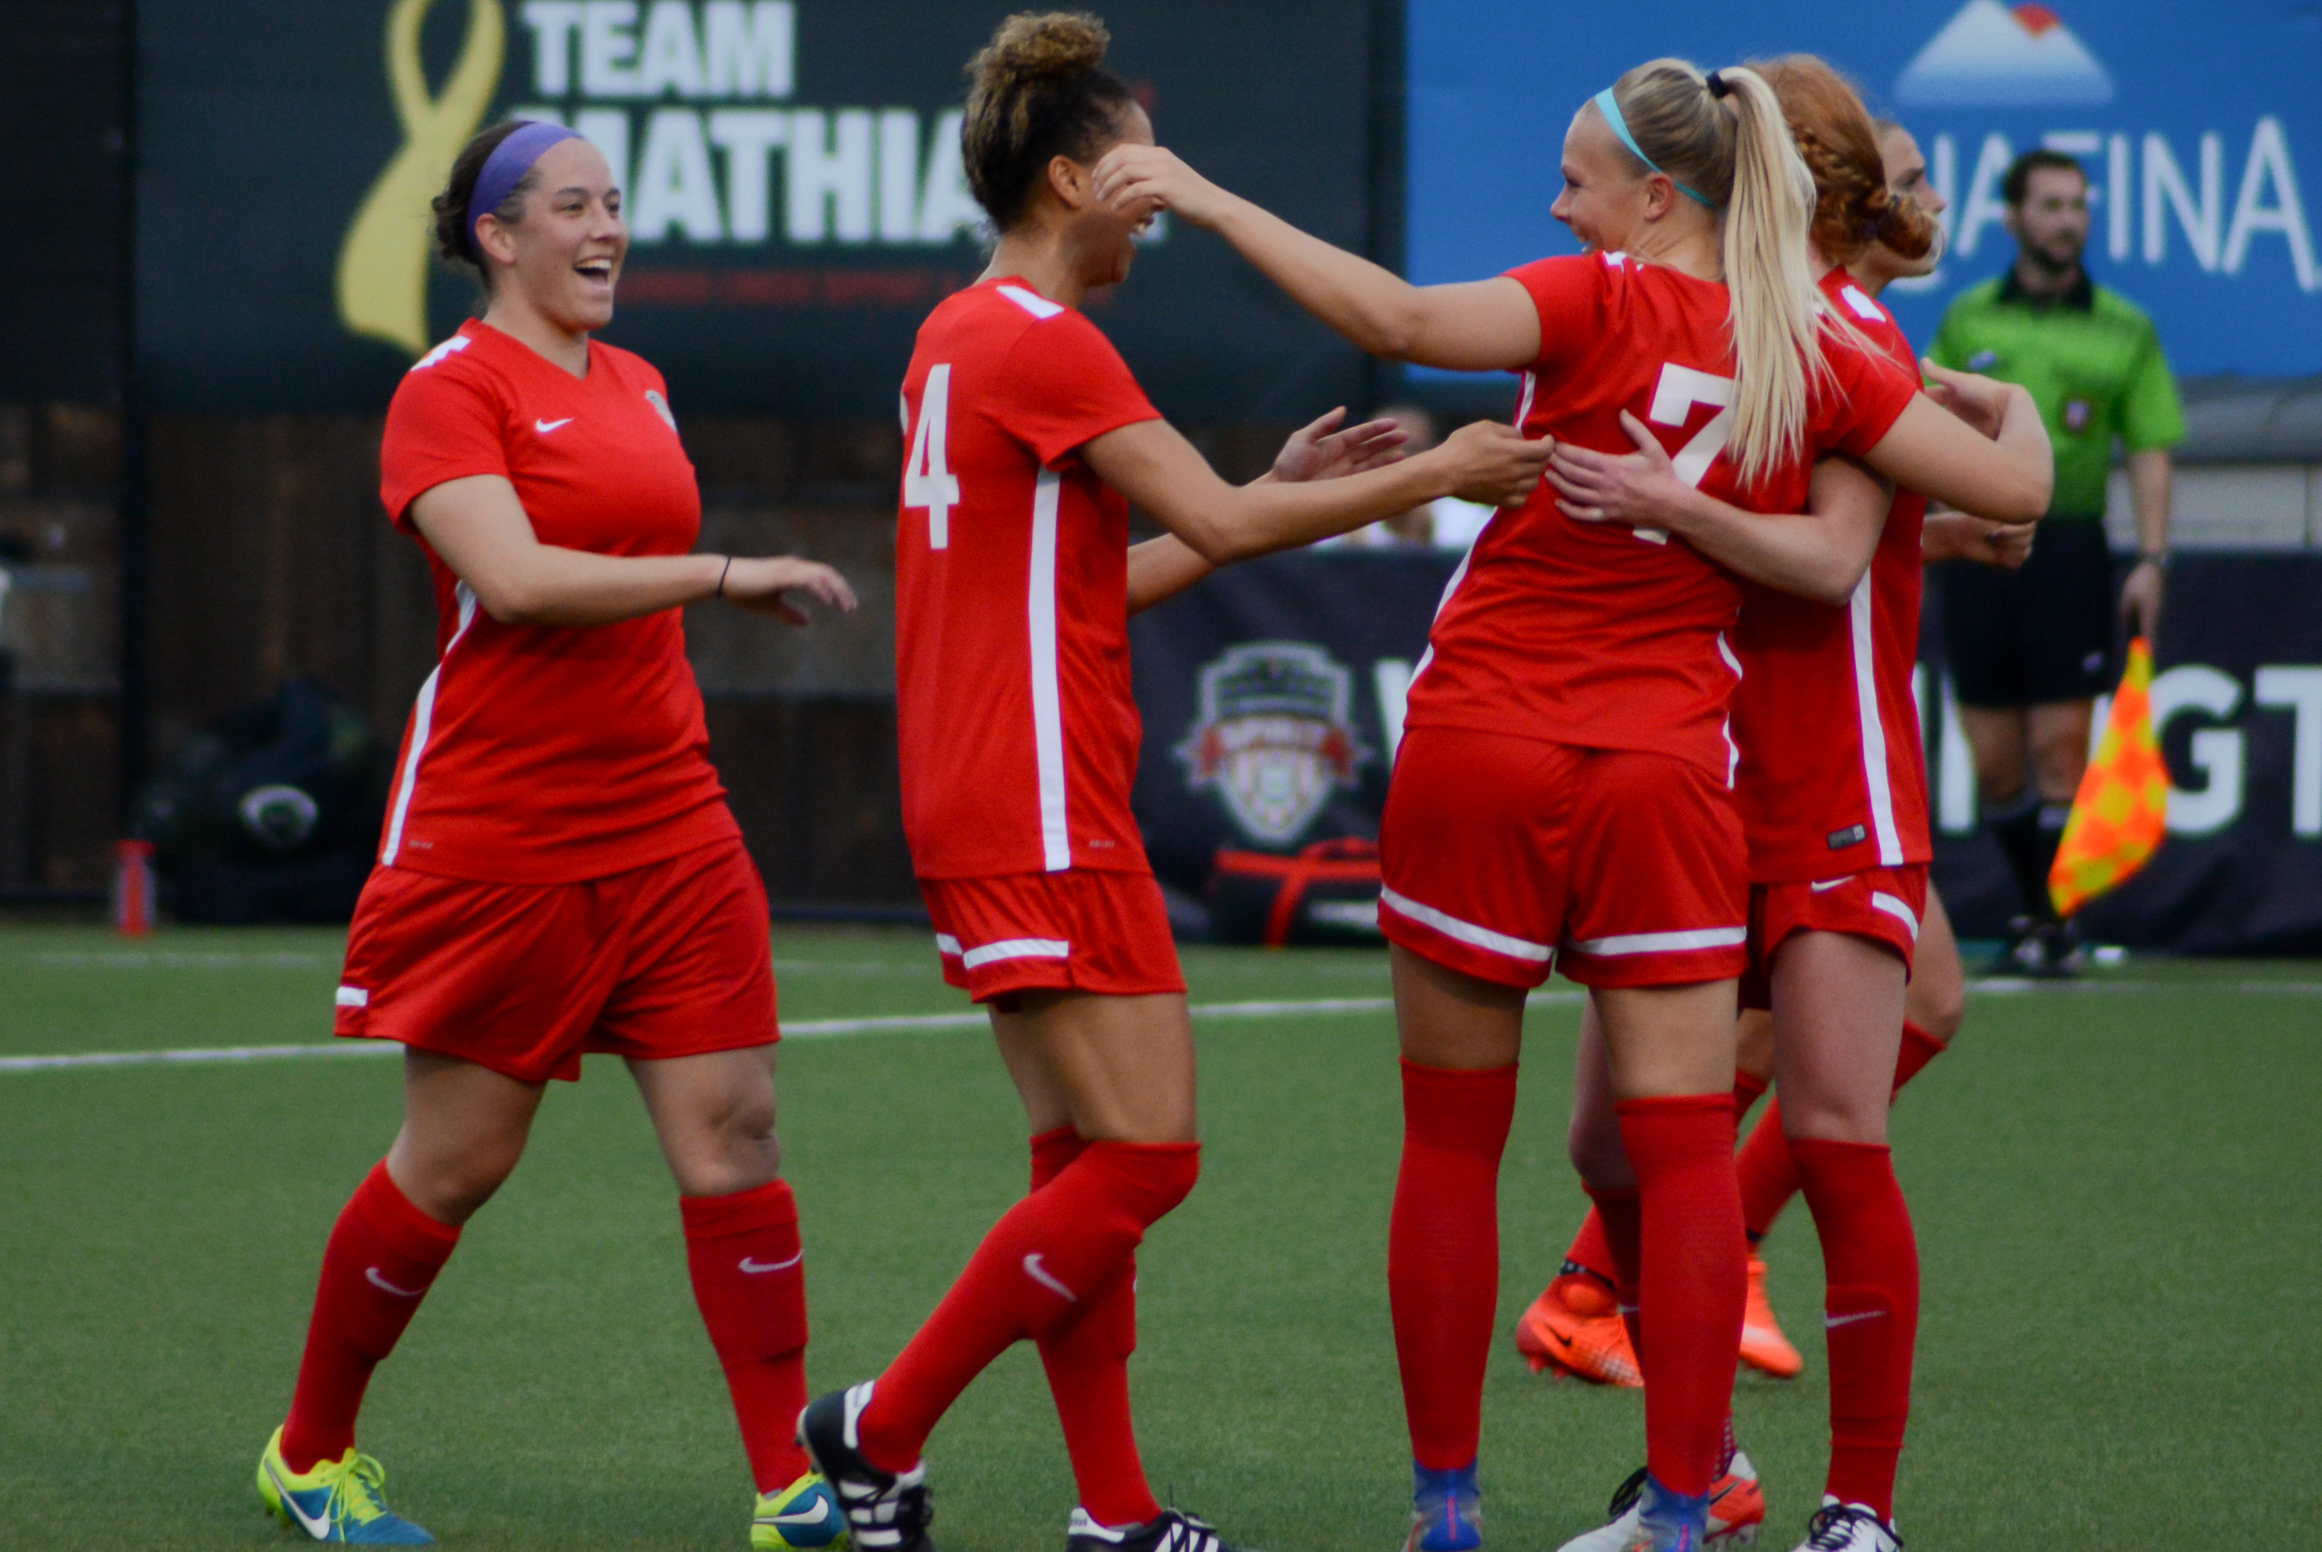 Washington Spirit players celebrate following Line Sigvardsen Jensen's goal